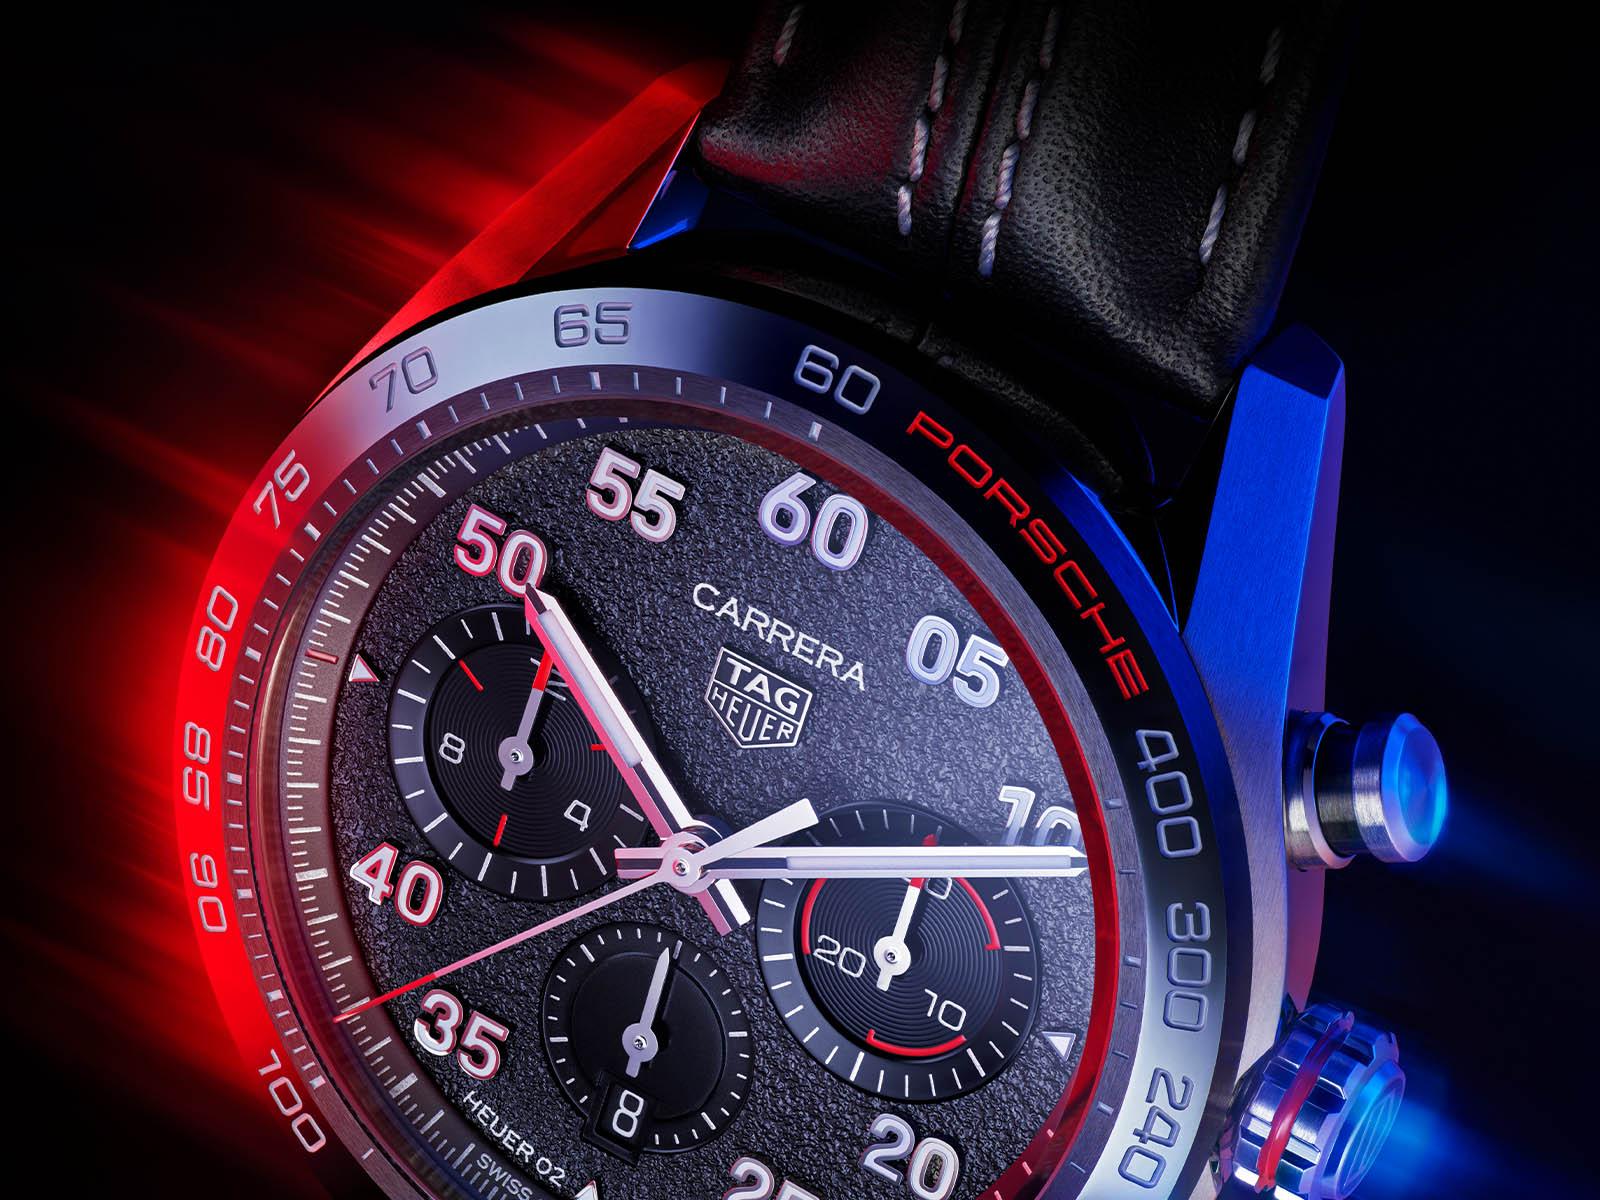 cbn2a1f-fc6492-tag-heuer-carrera-porsche-chronograph-4.jpg